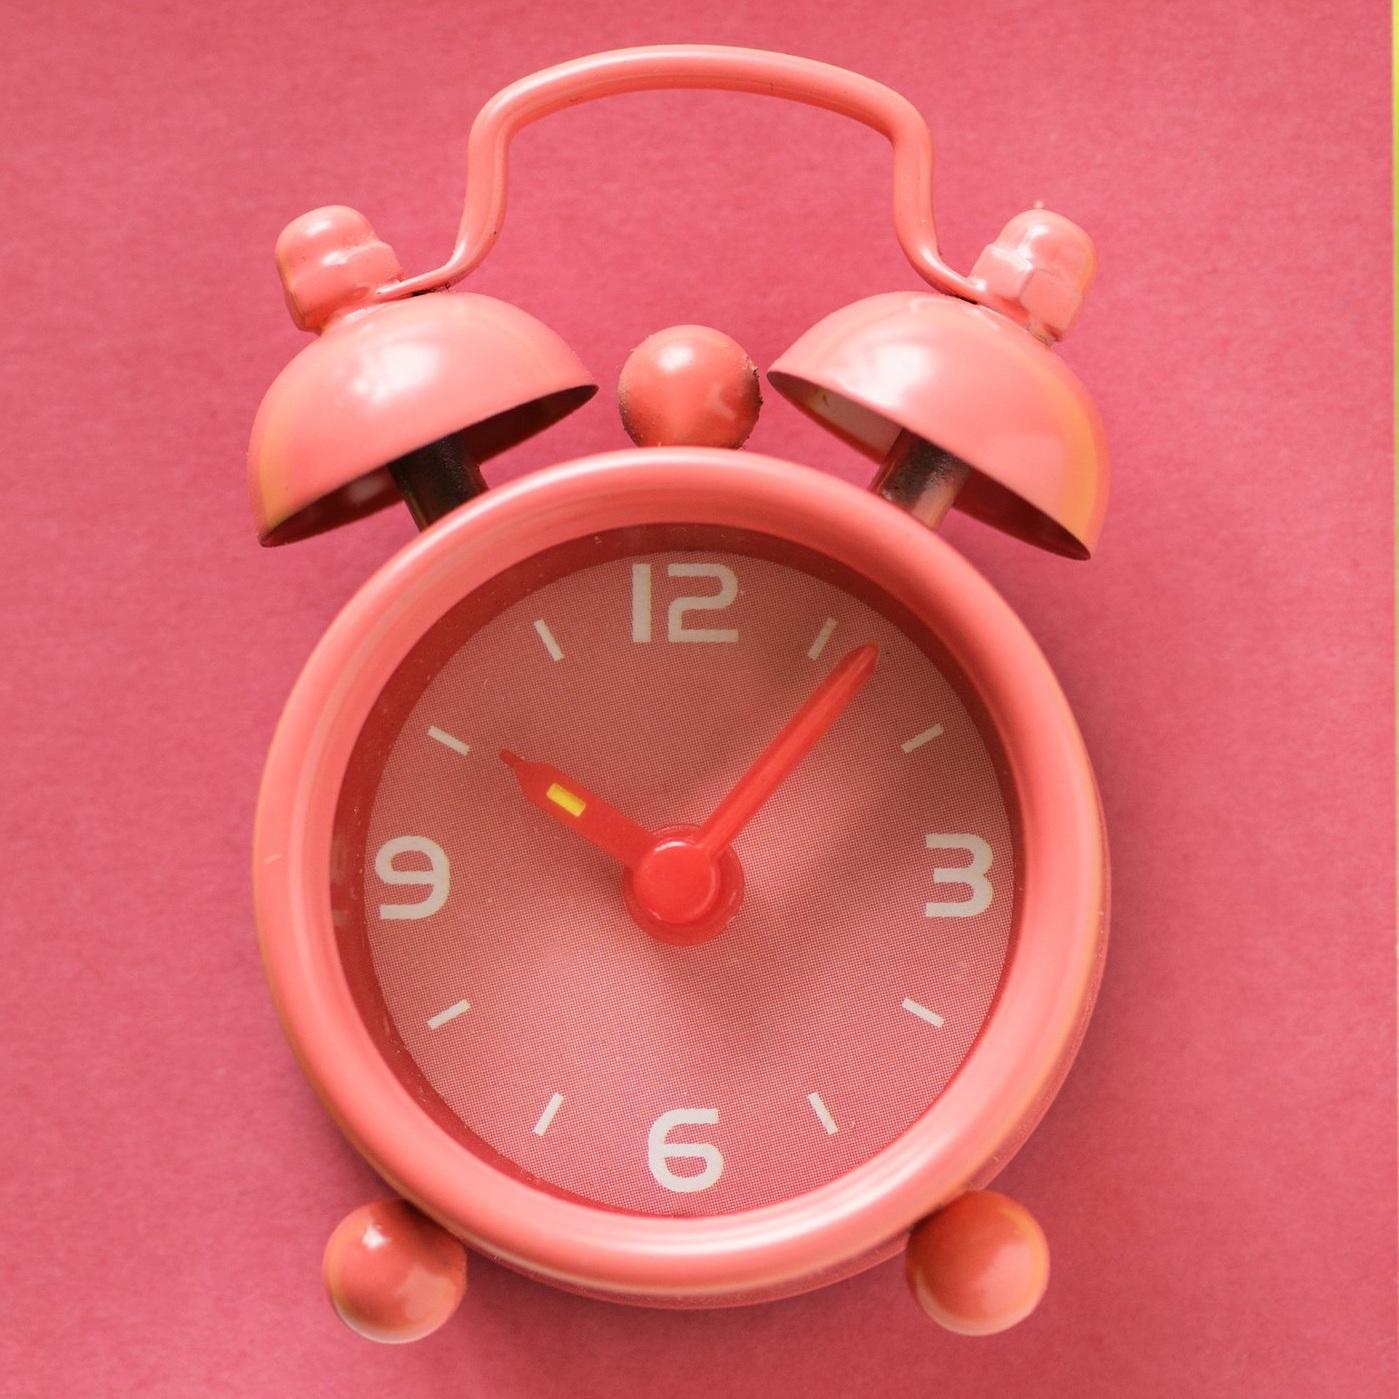 alarm-alarm-clock-analog-1162967.jpg